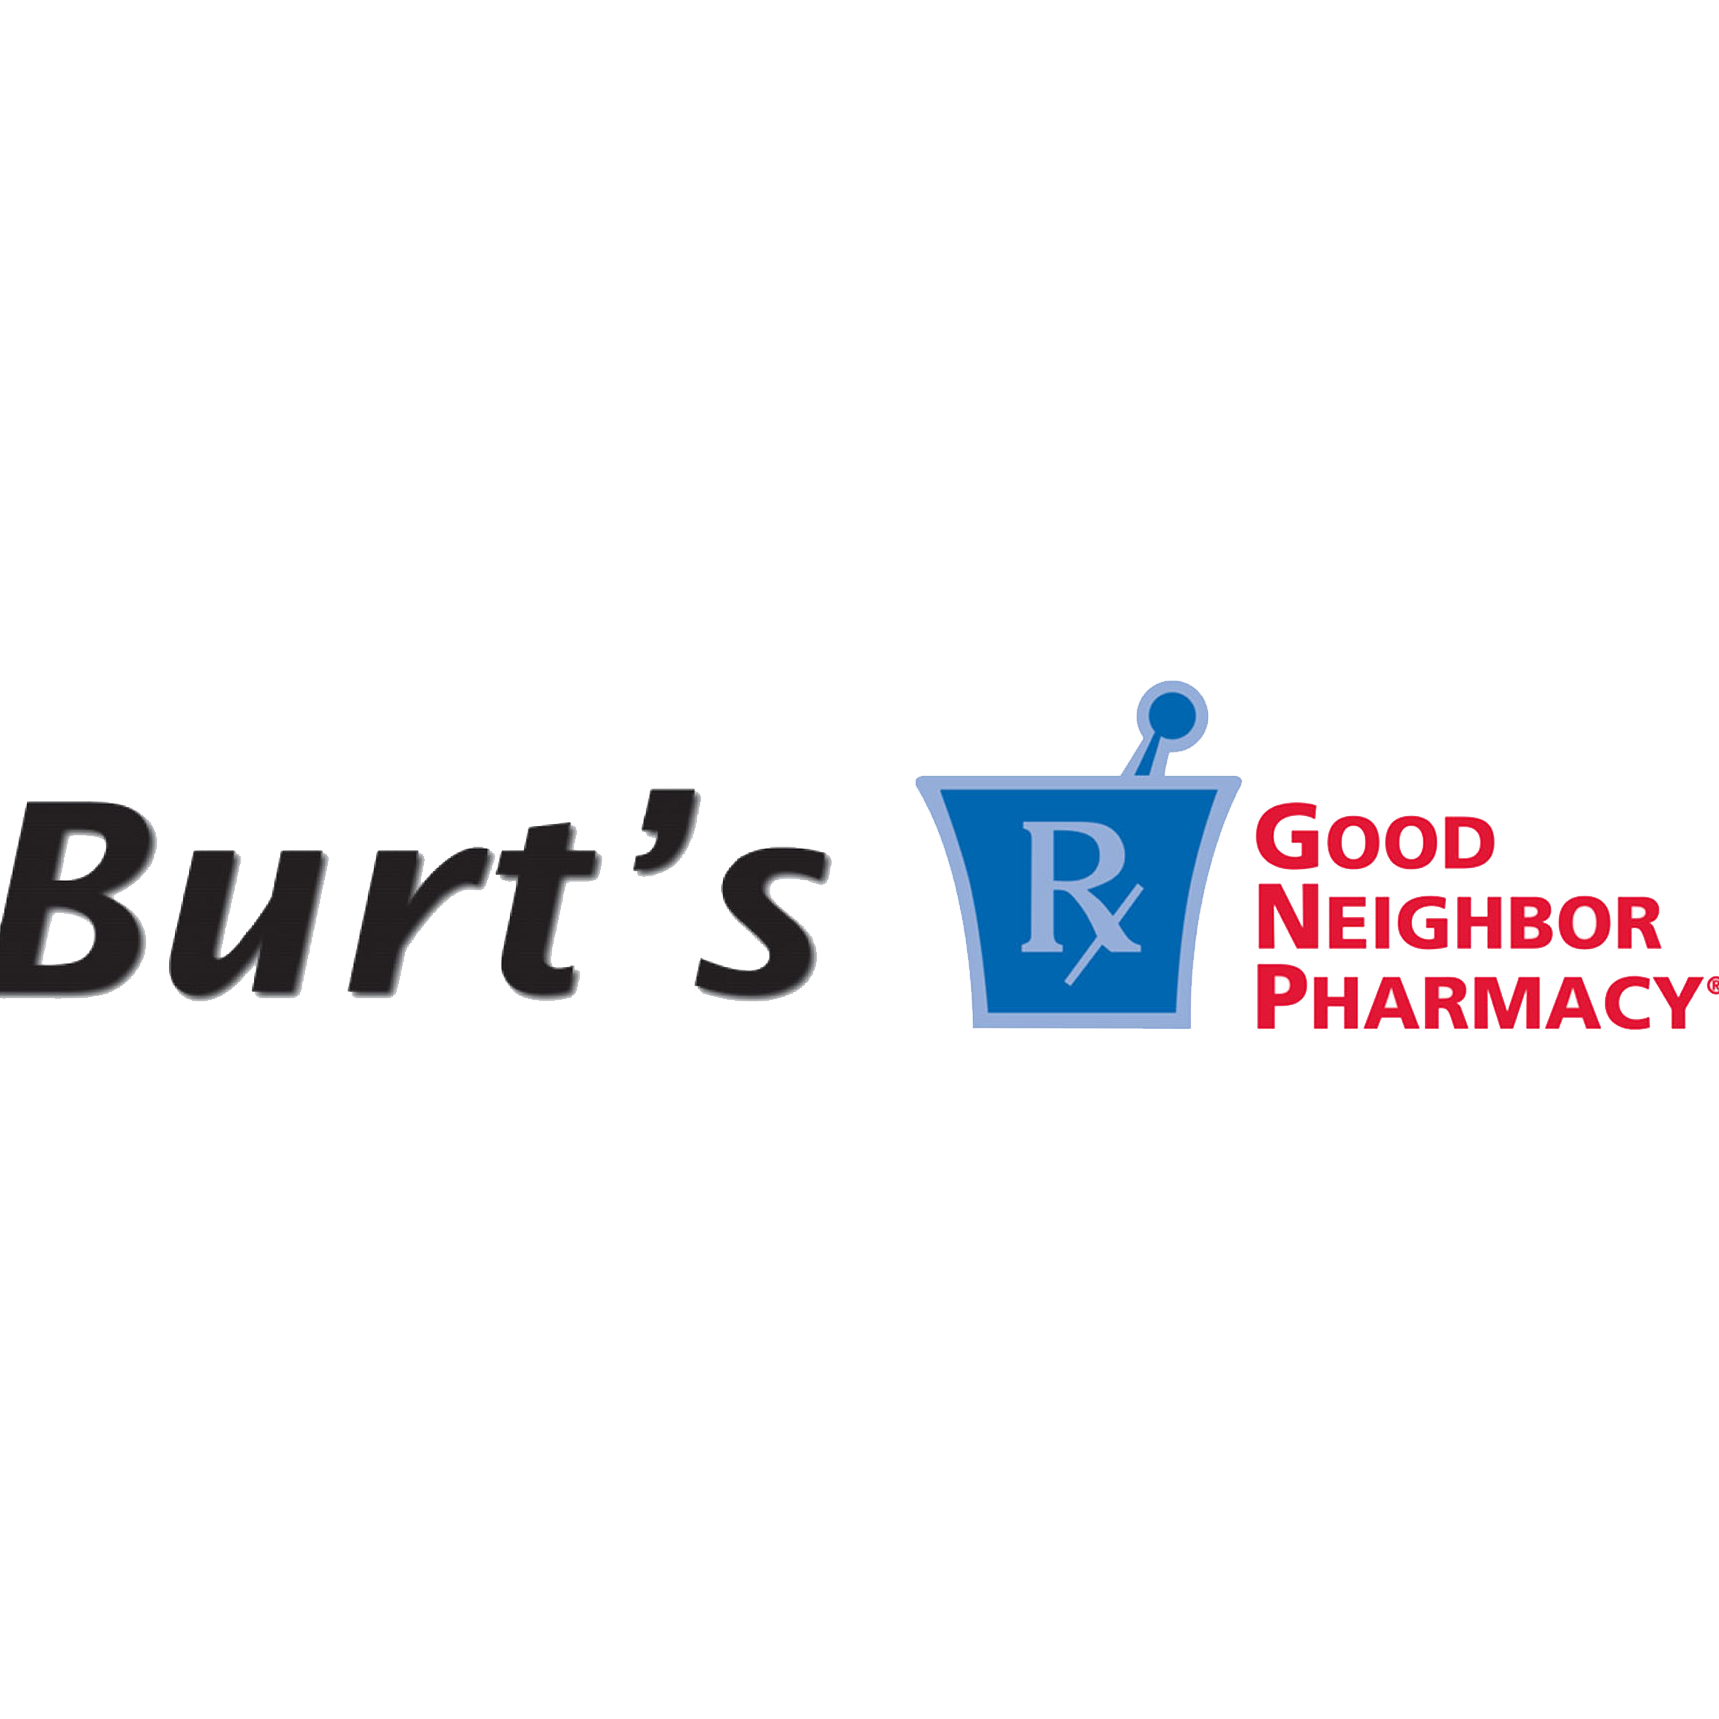 Burt's Pharmacy and Compounding Lab - Newbury Park